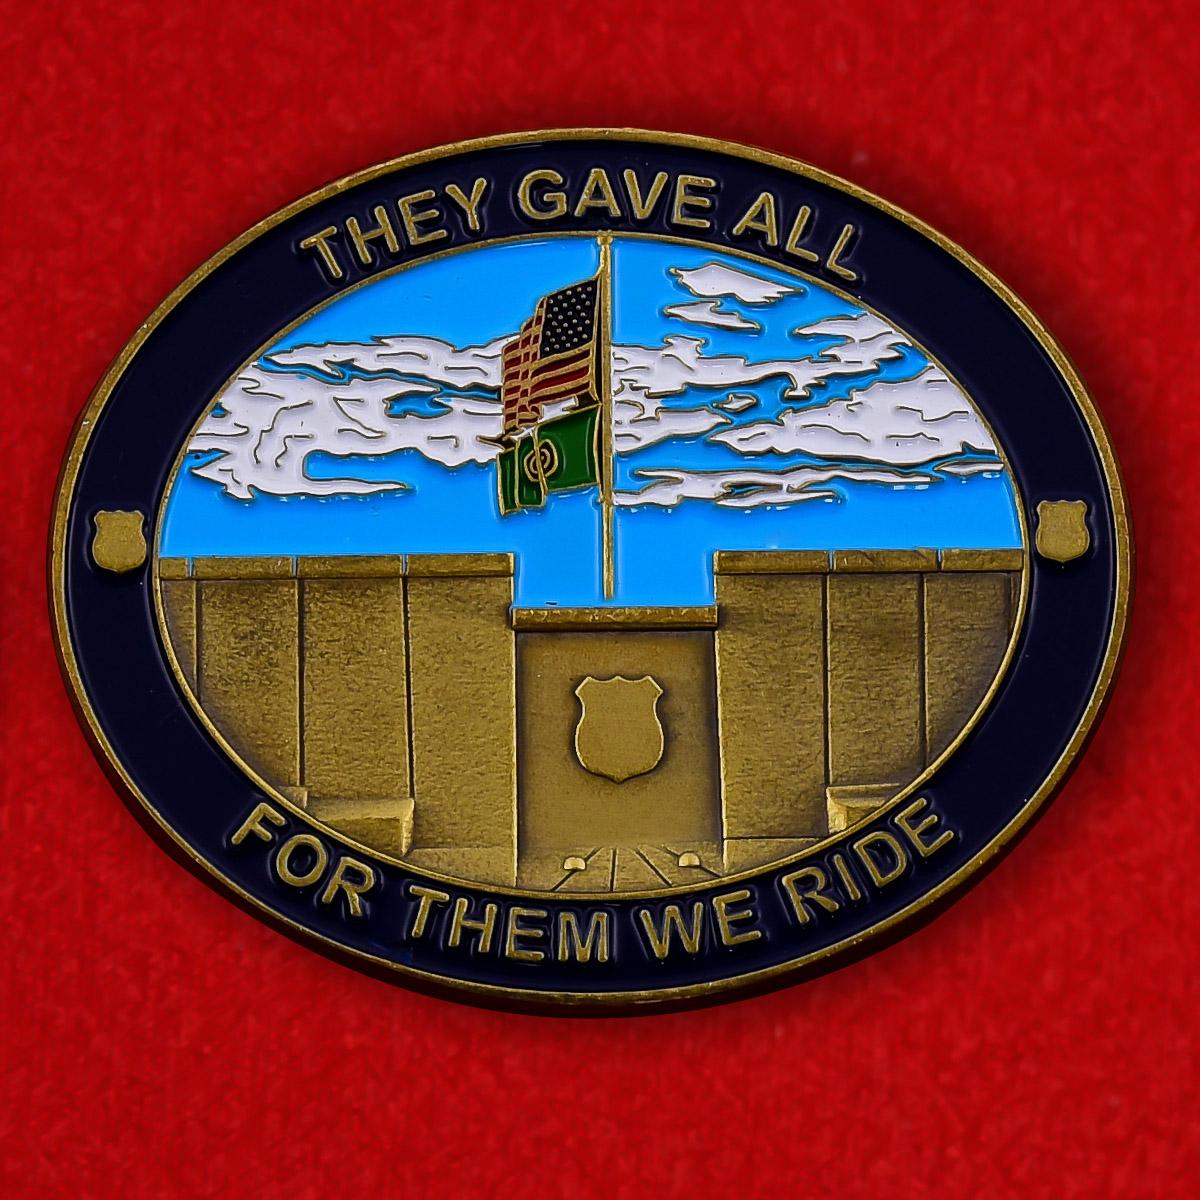 Челлендж коин мотопробега Forza 009 памяти погибших полицейских